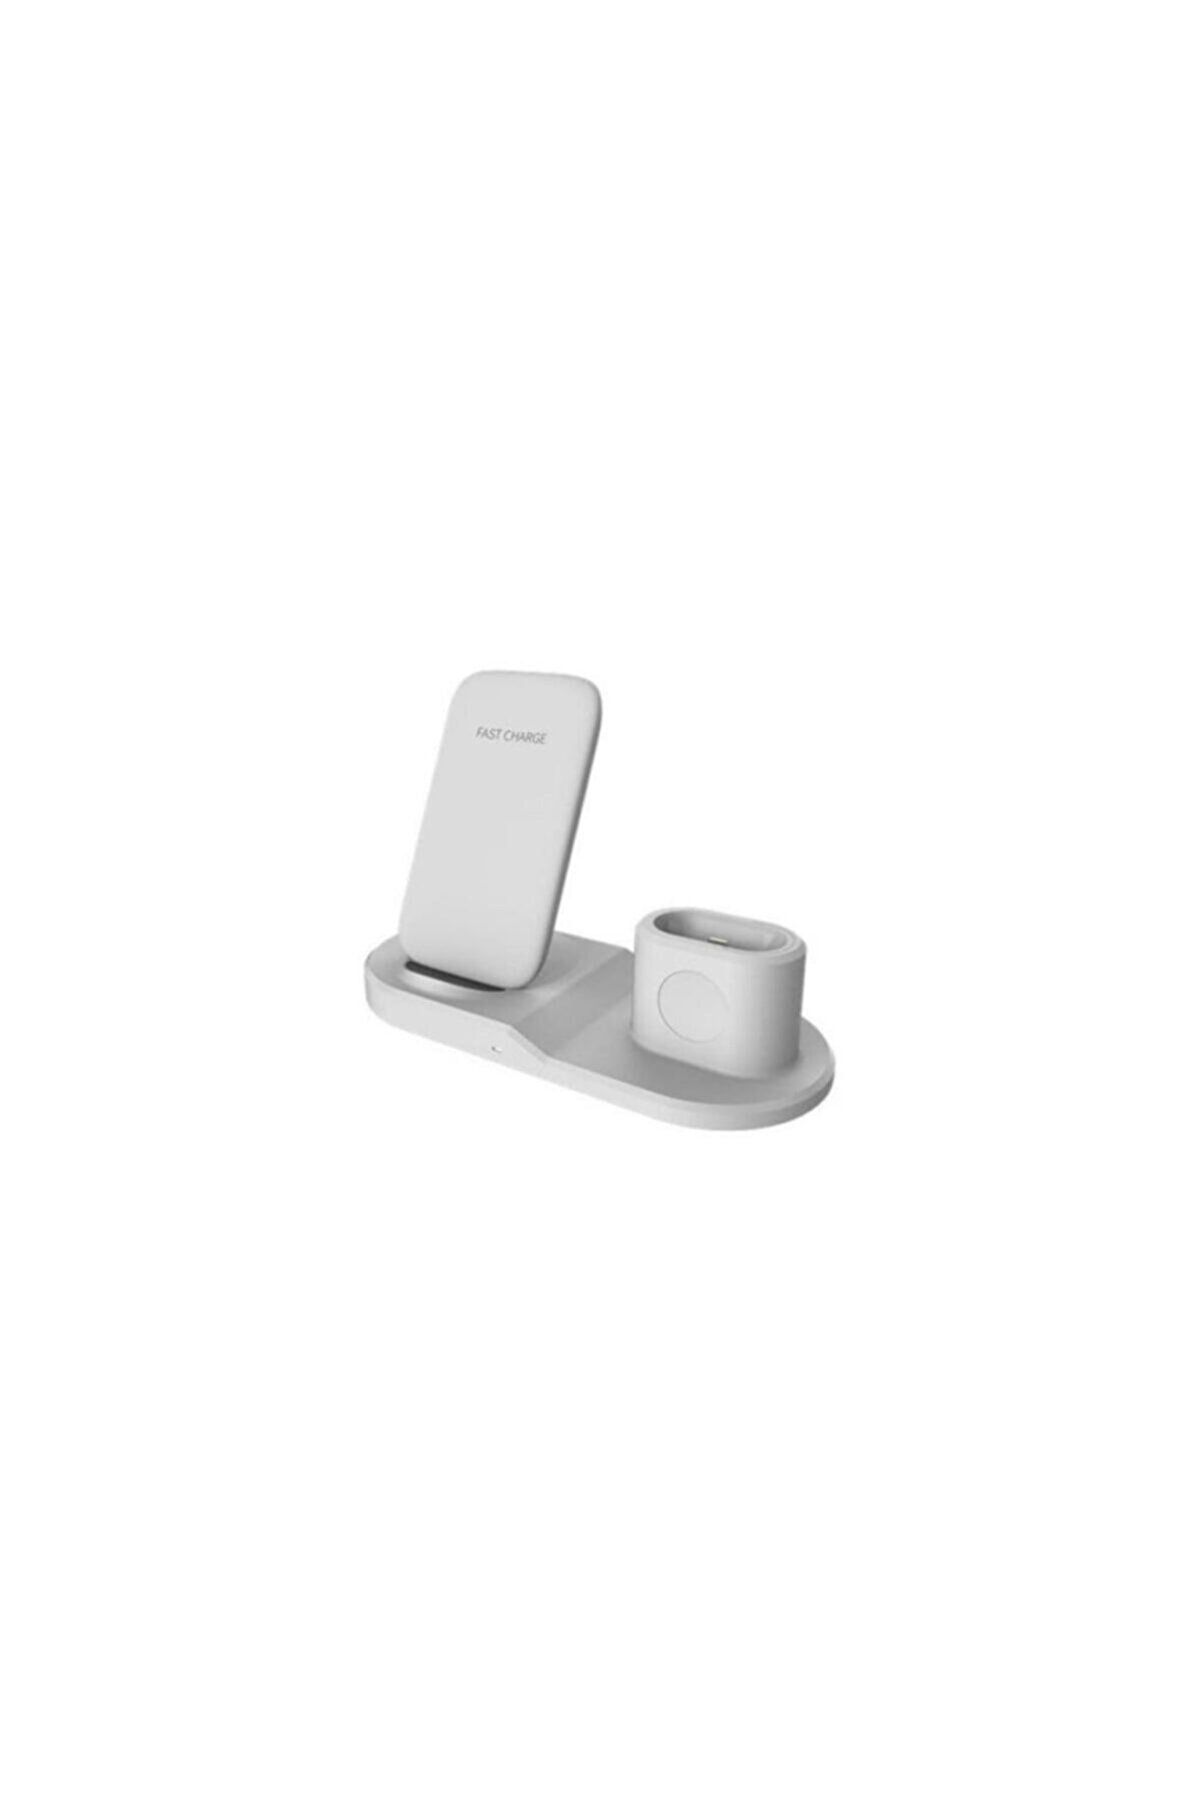 Techmaster 3in1 10w Kablosuz Iphone Airpods Apple Watch Şarj Standı Ojd-45